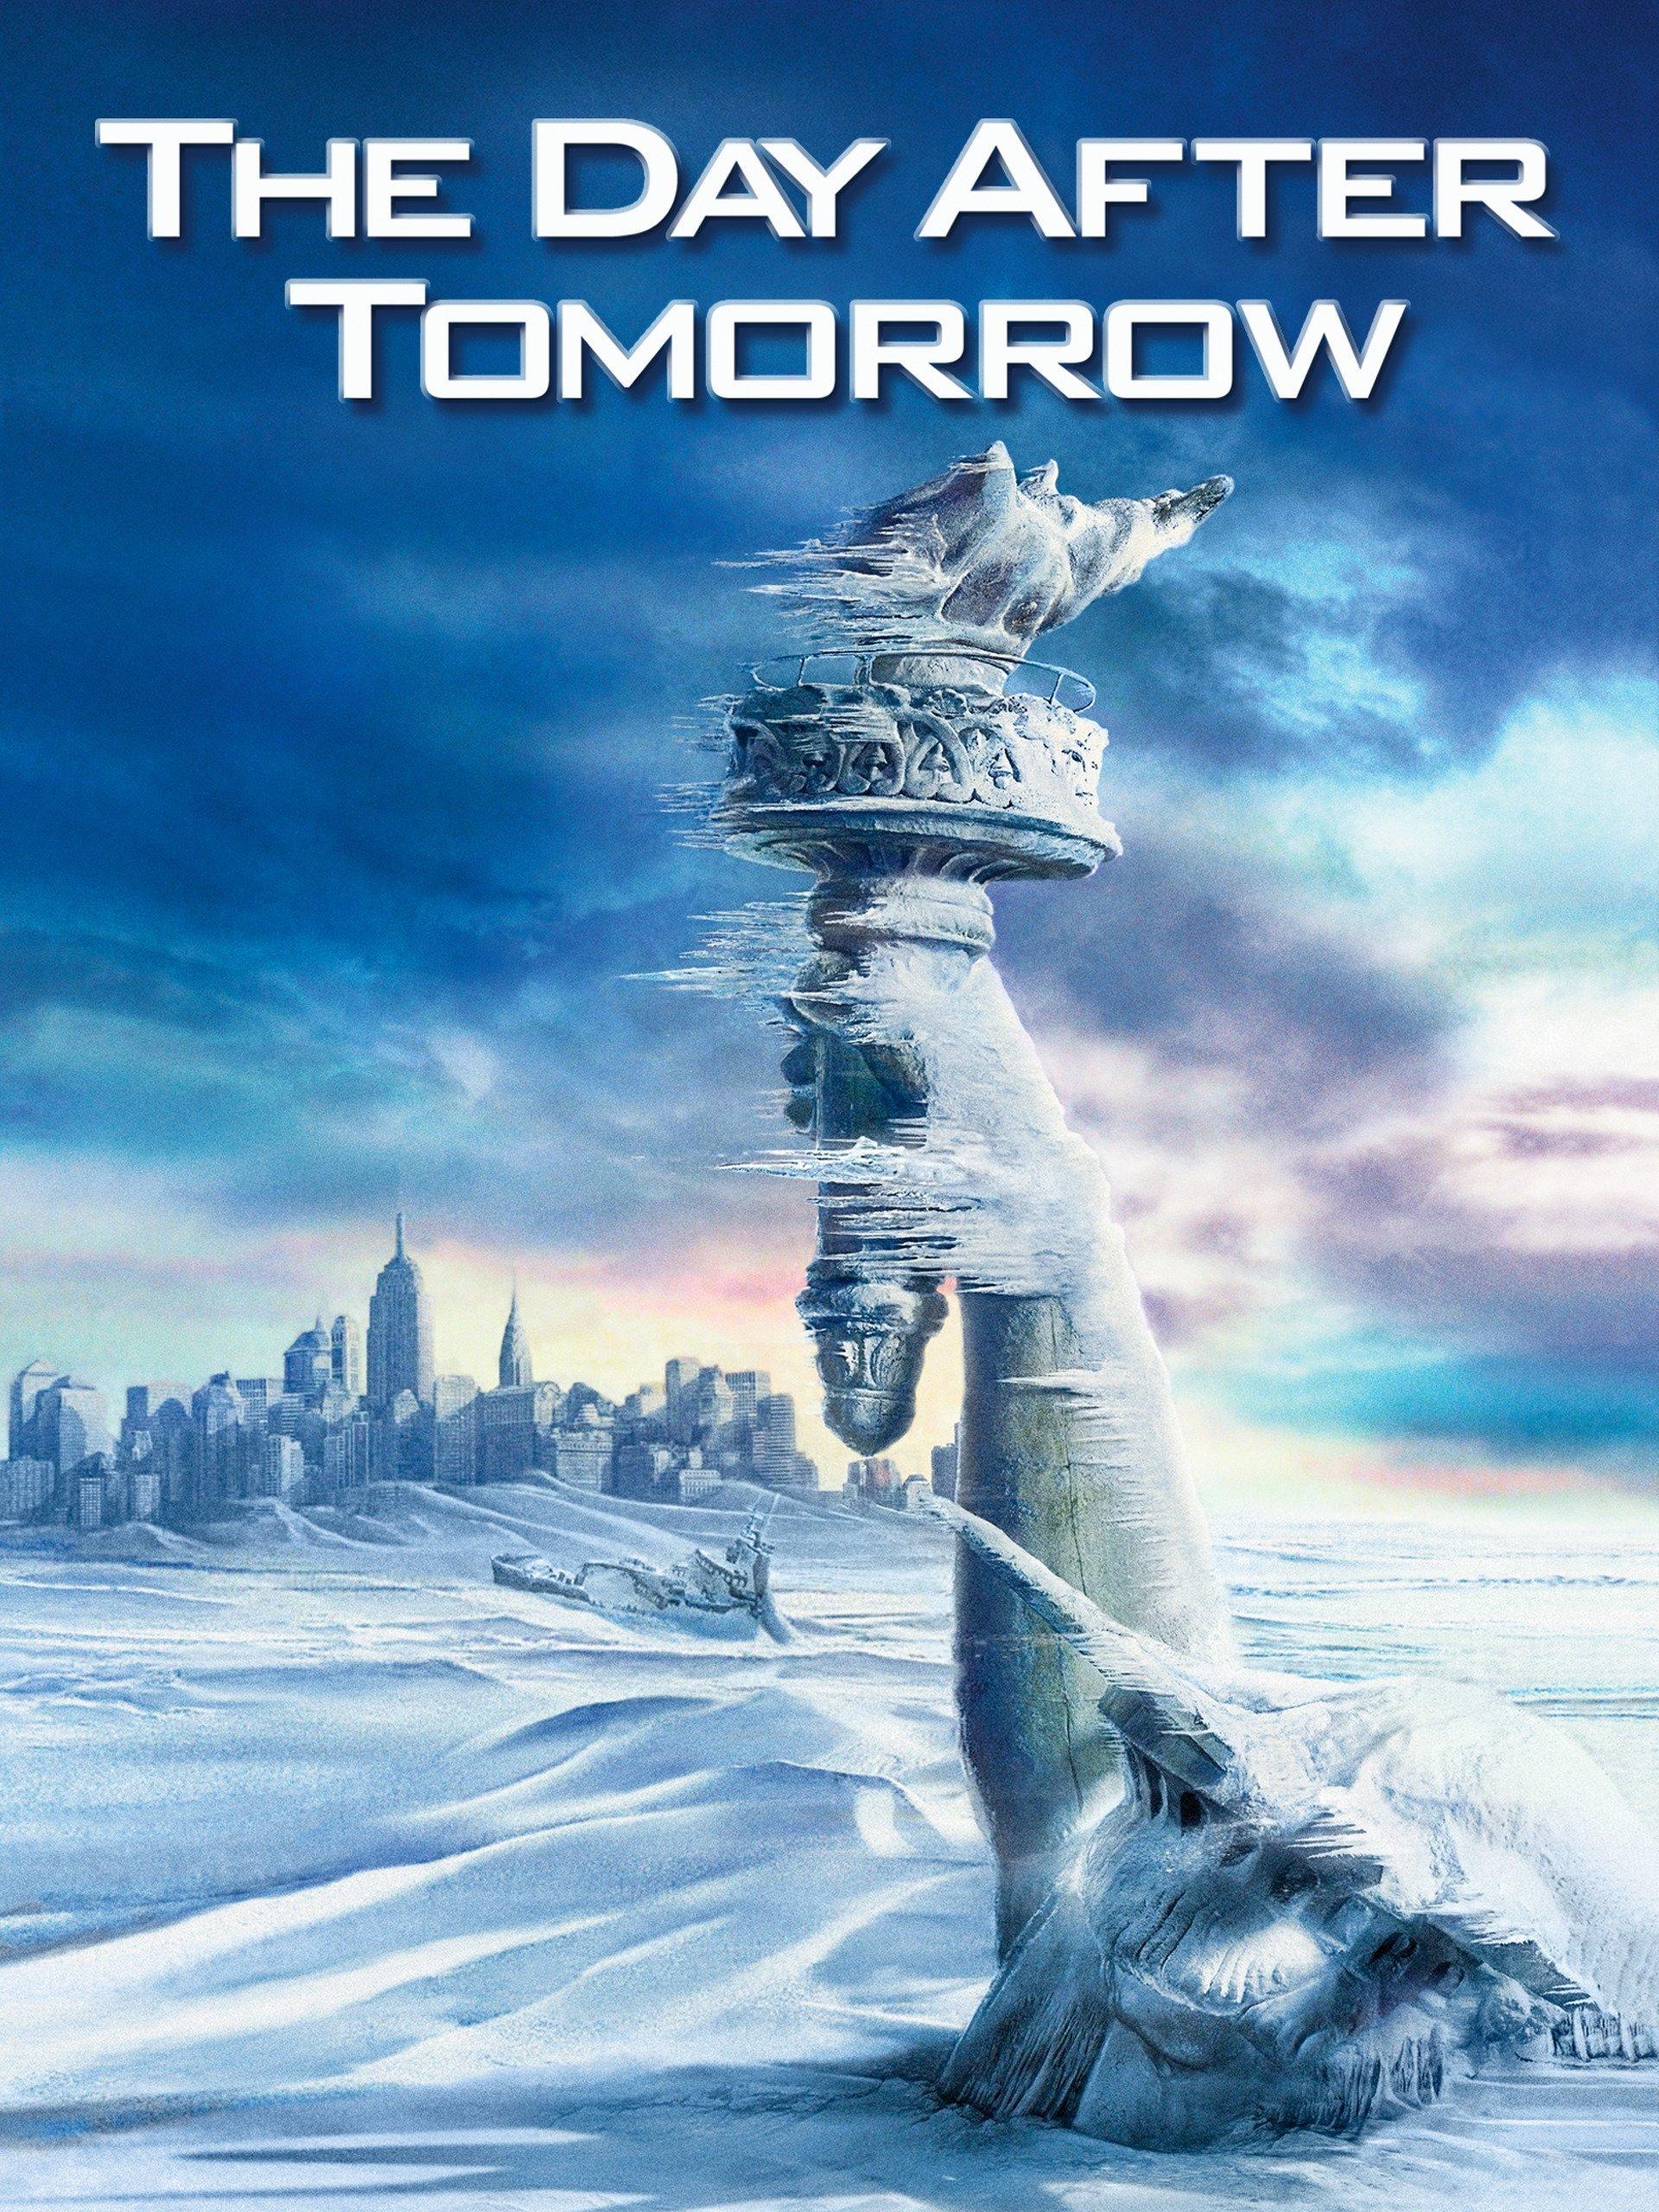 Amazon Com The Day After Tomorrow Dennis Quaid Jake Gyllenhaal Emmy Rossum Dash Mihok Amazon Digital Services Llc